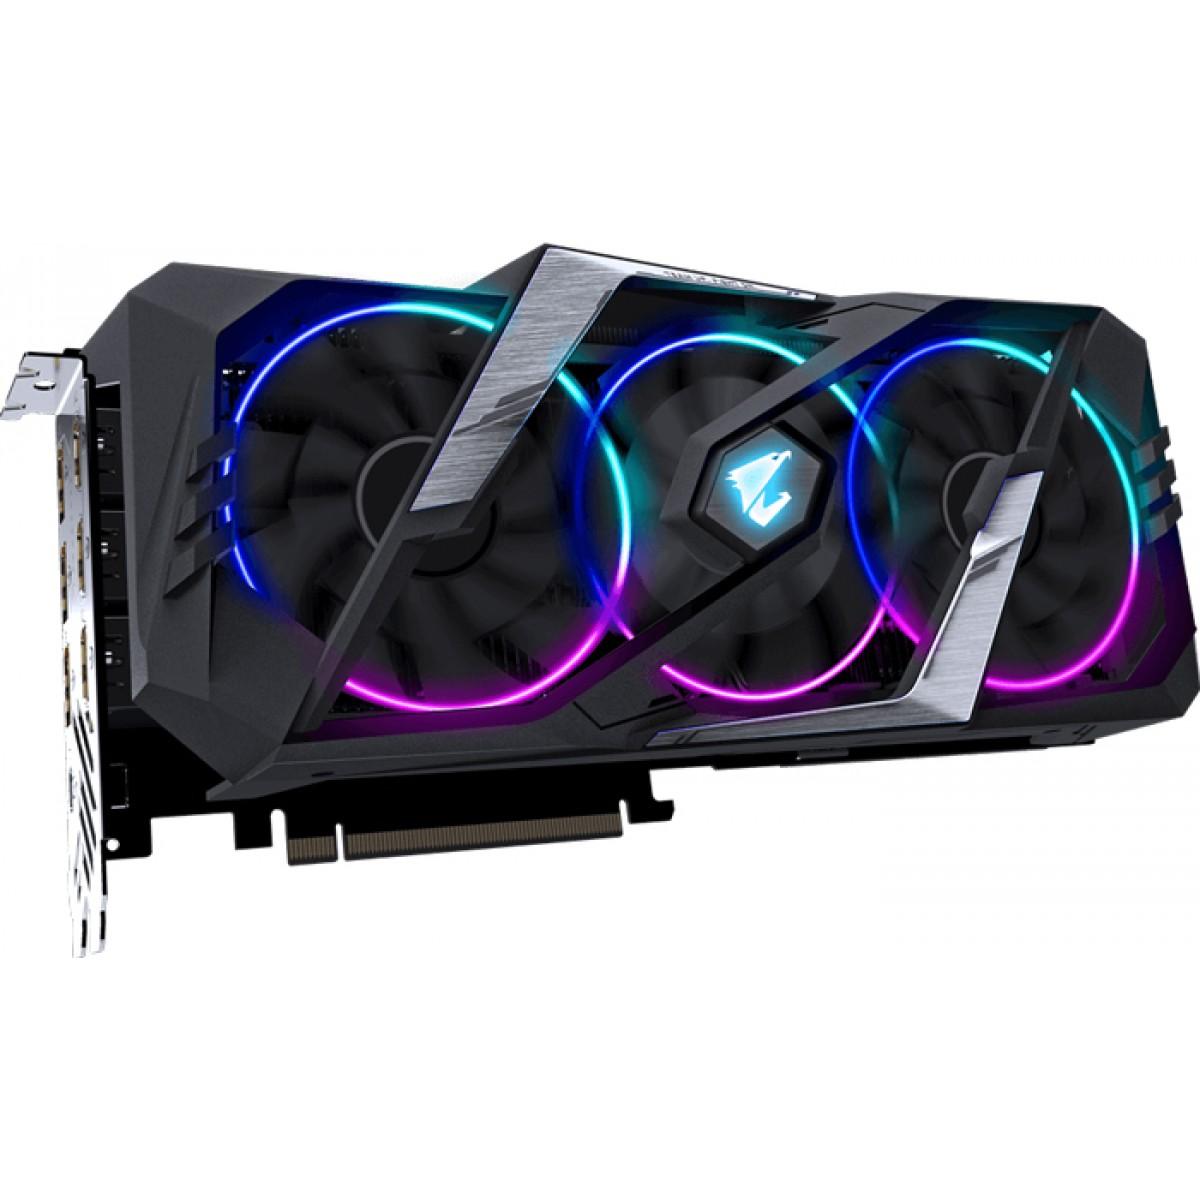 Placa de Vídeo Gigabyte GeForce RTX 2070 Super, 8GB GDDR6, 256Bit